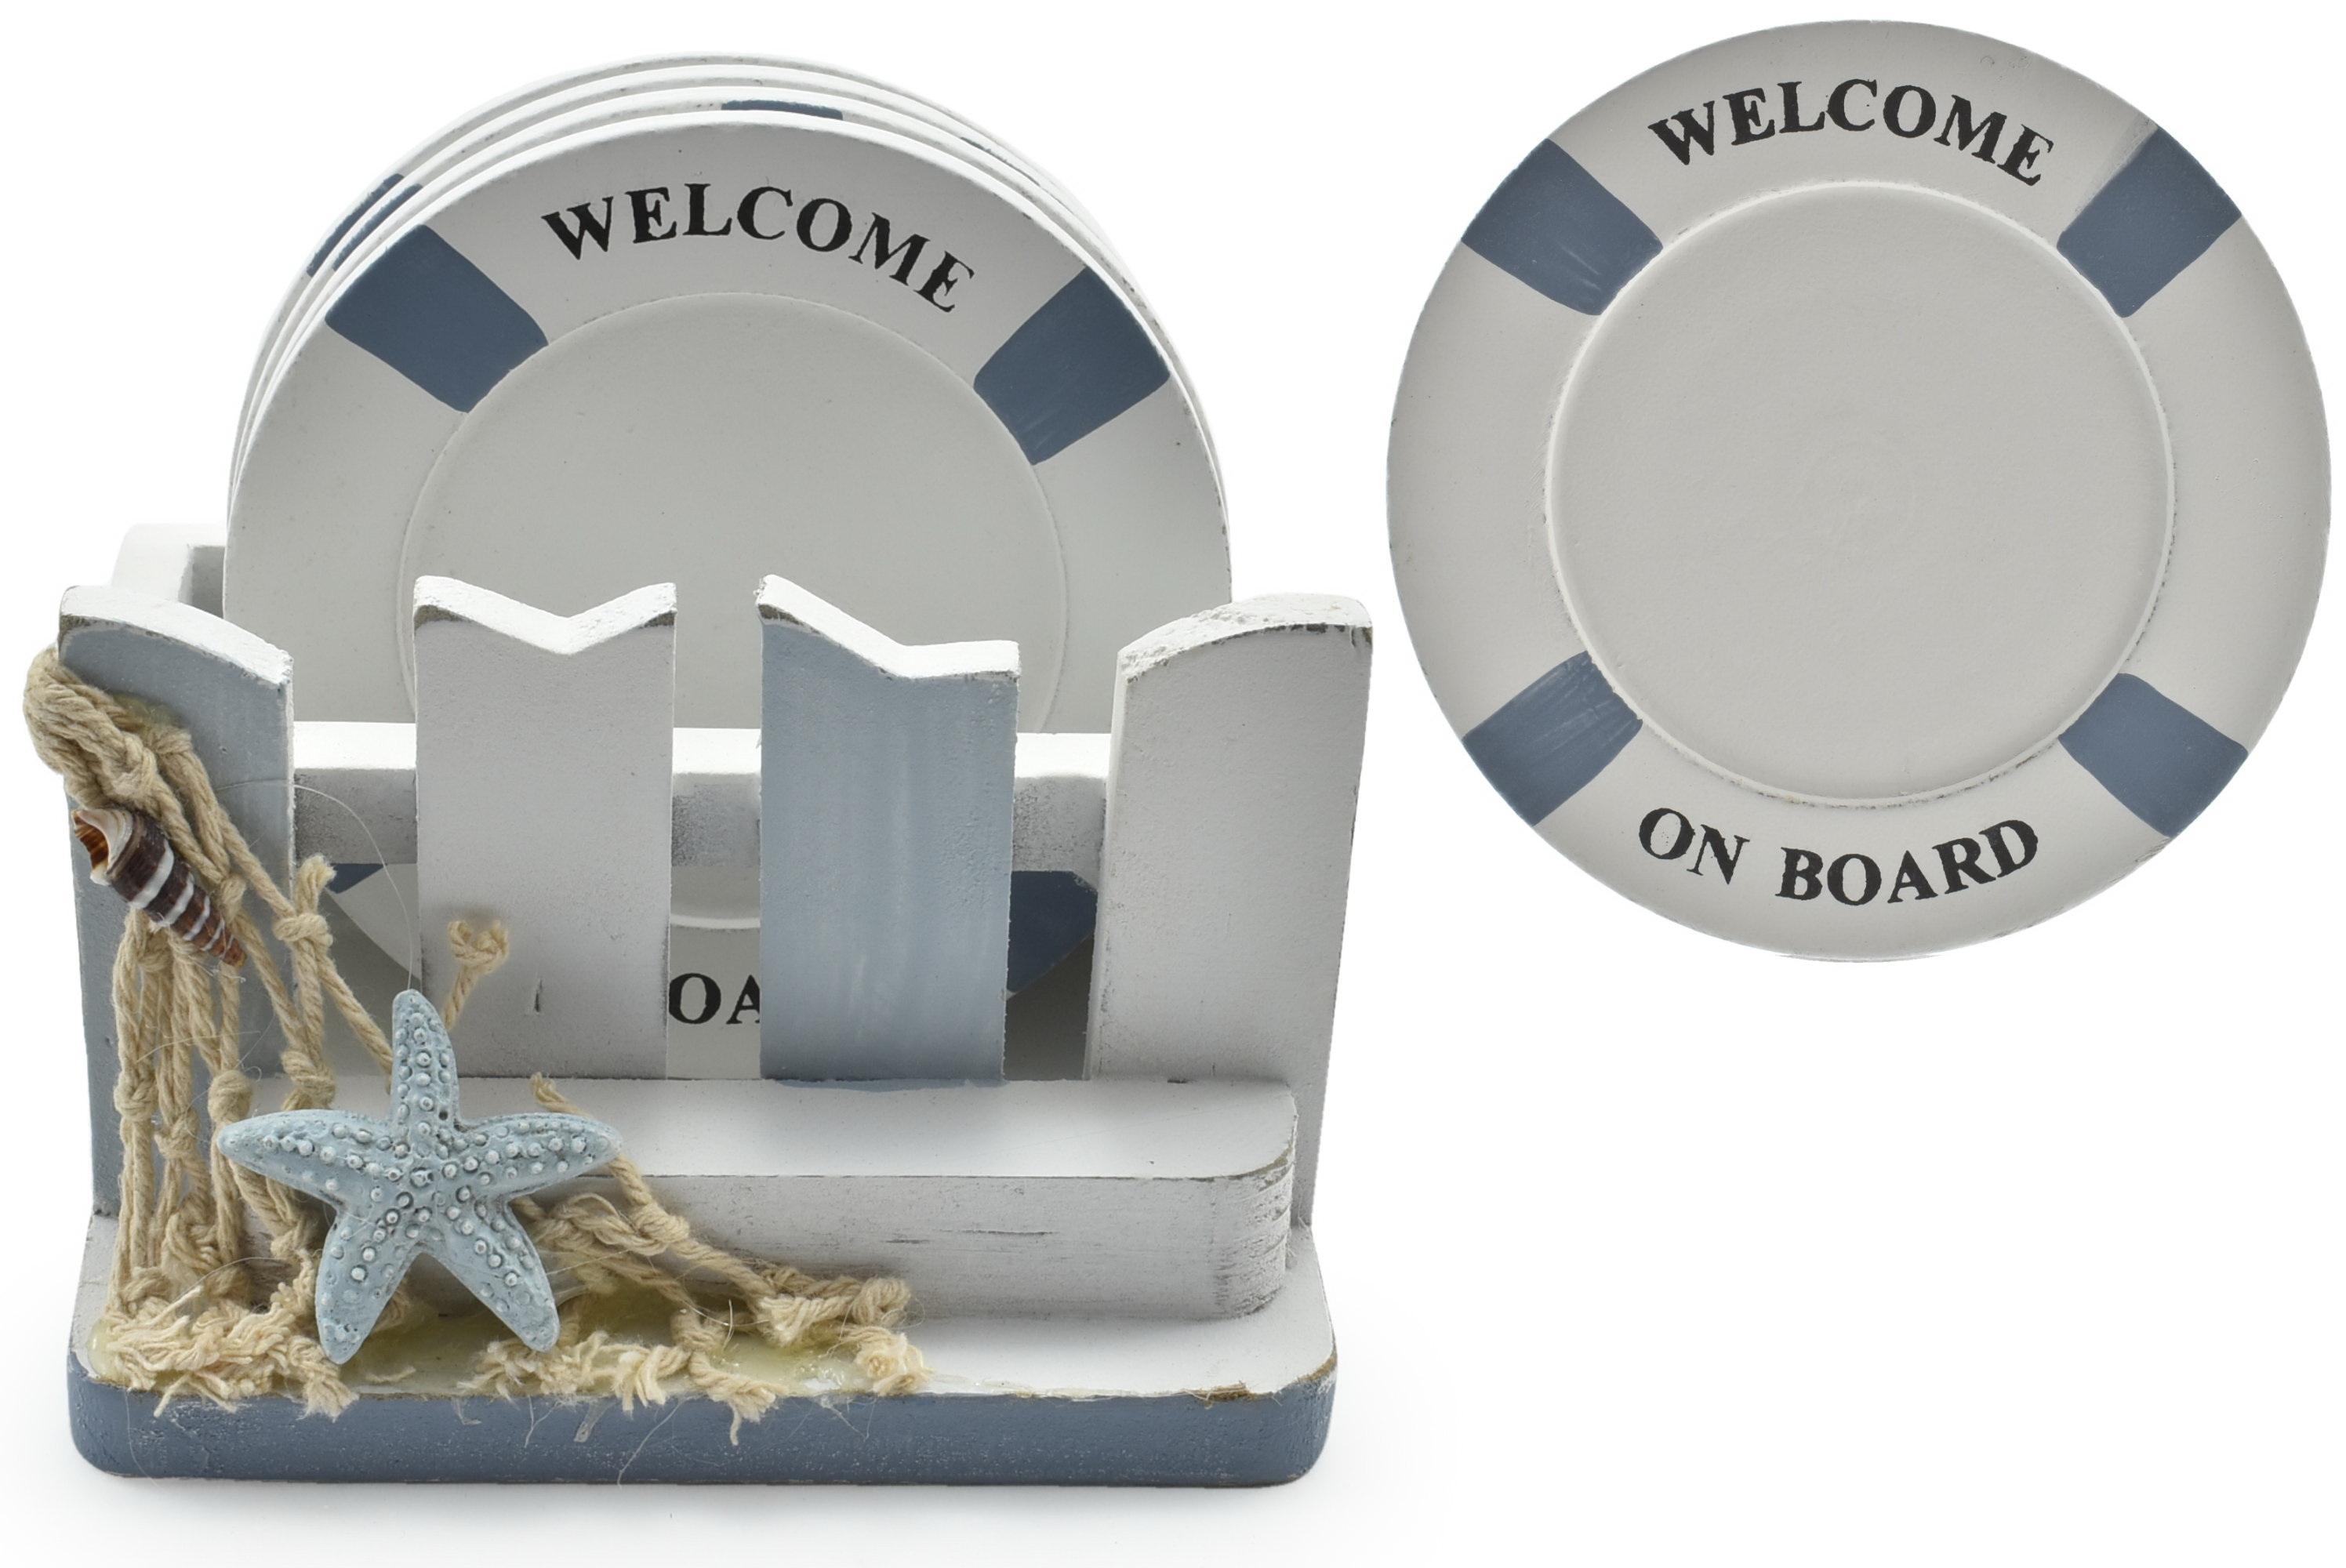 Wooden 4pc Coaster Set